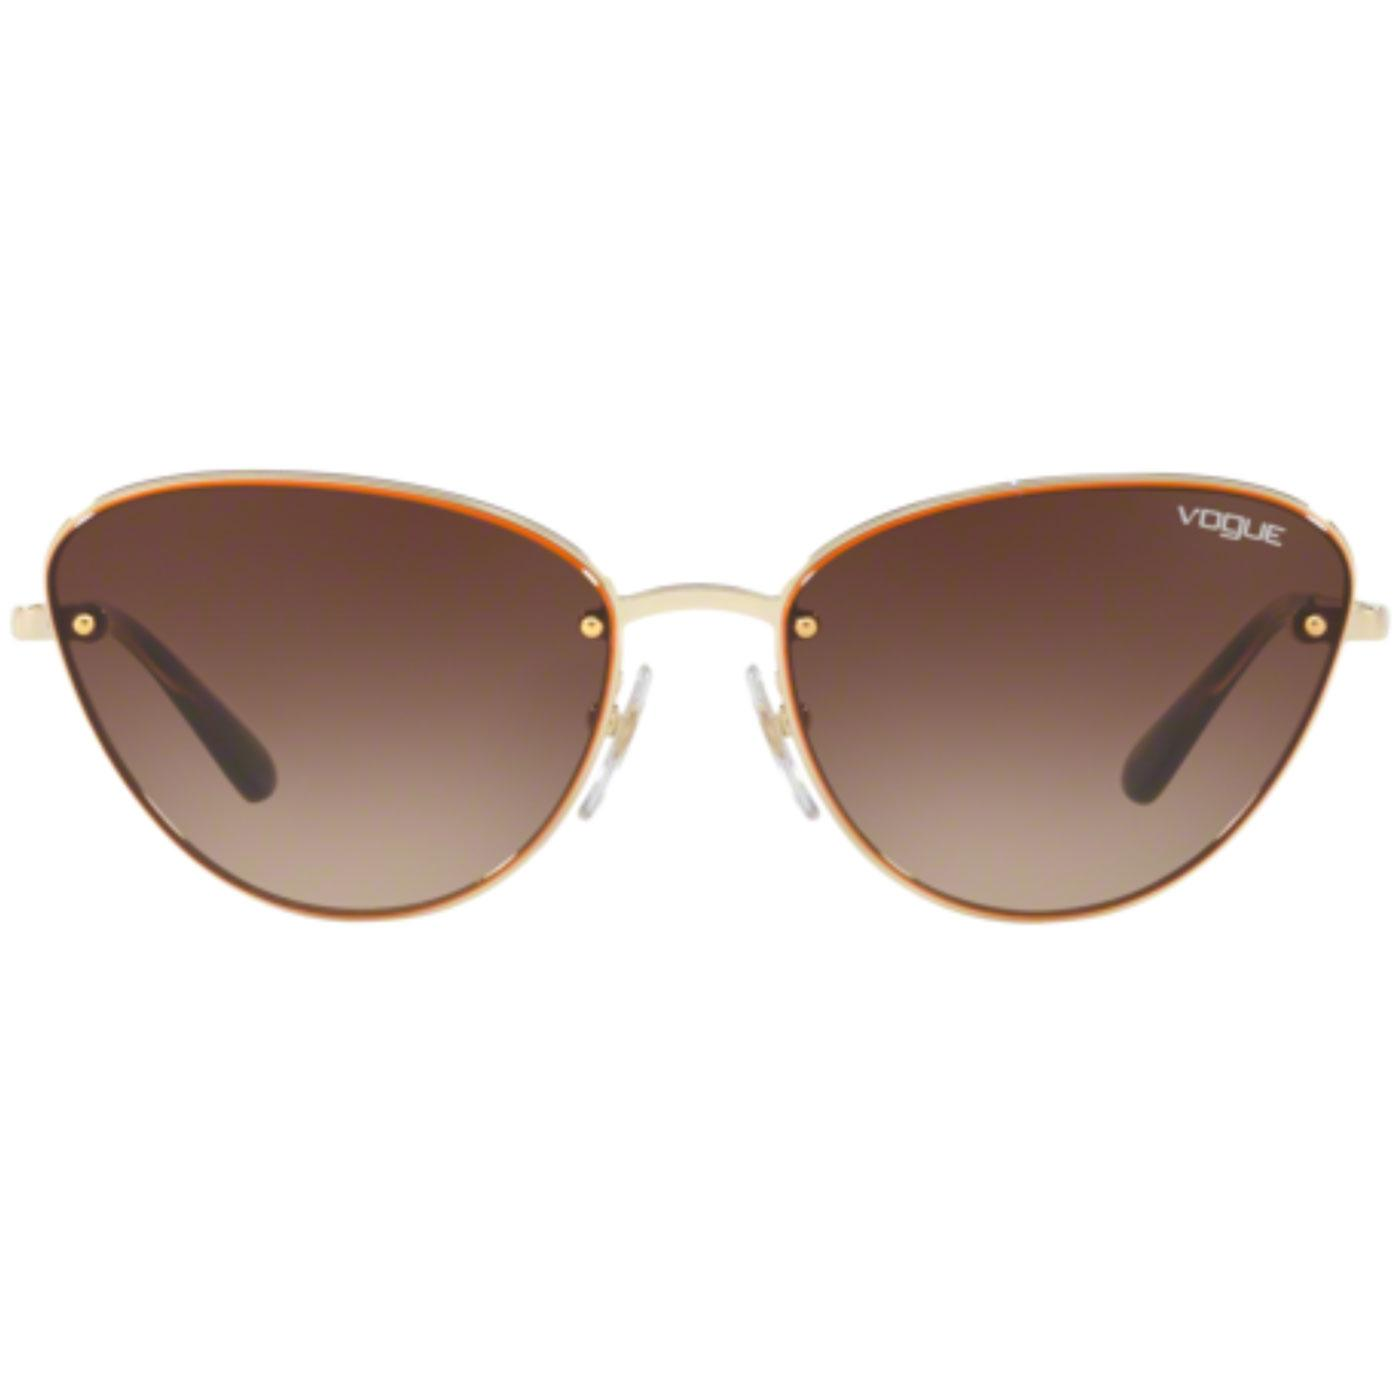 VOGUE Retro 60s Flat Front Cats-Eye Sunglasses O